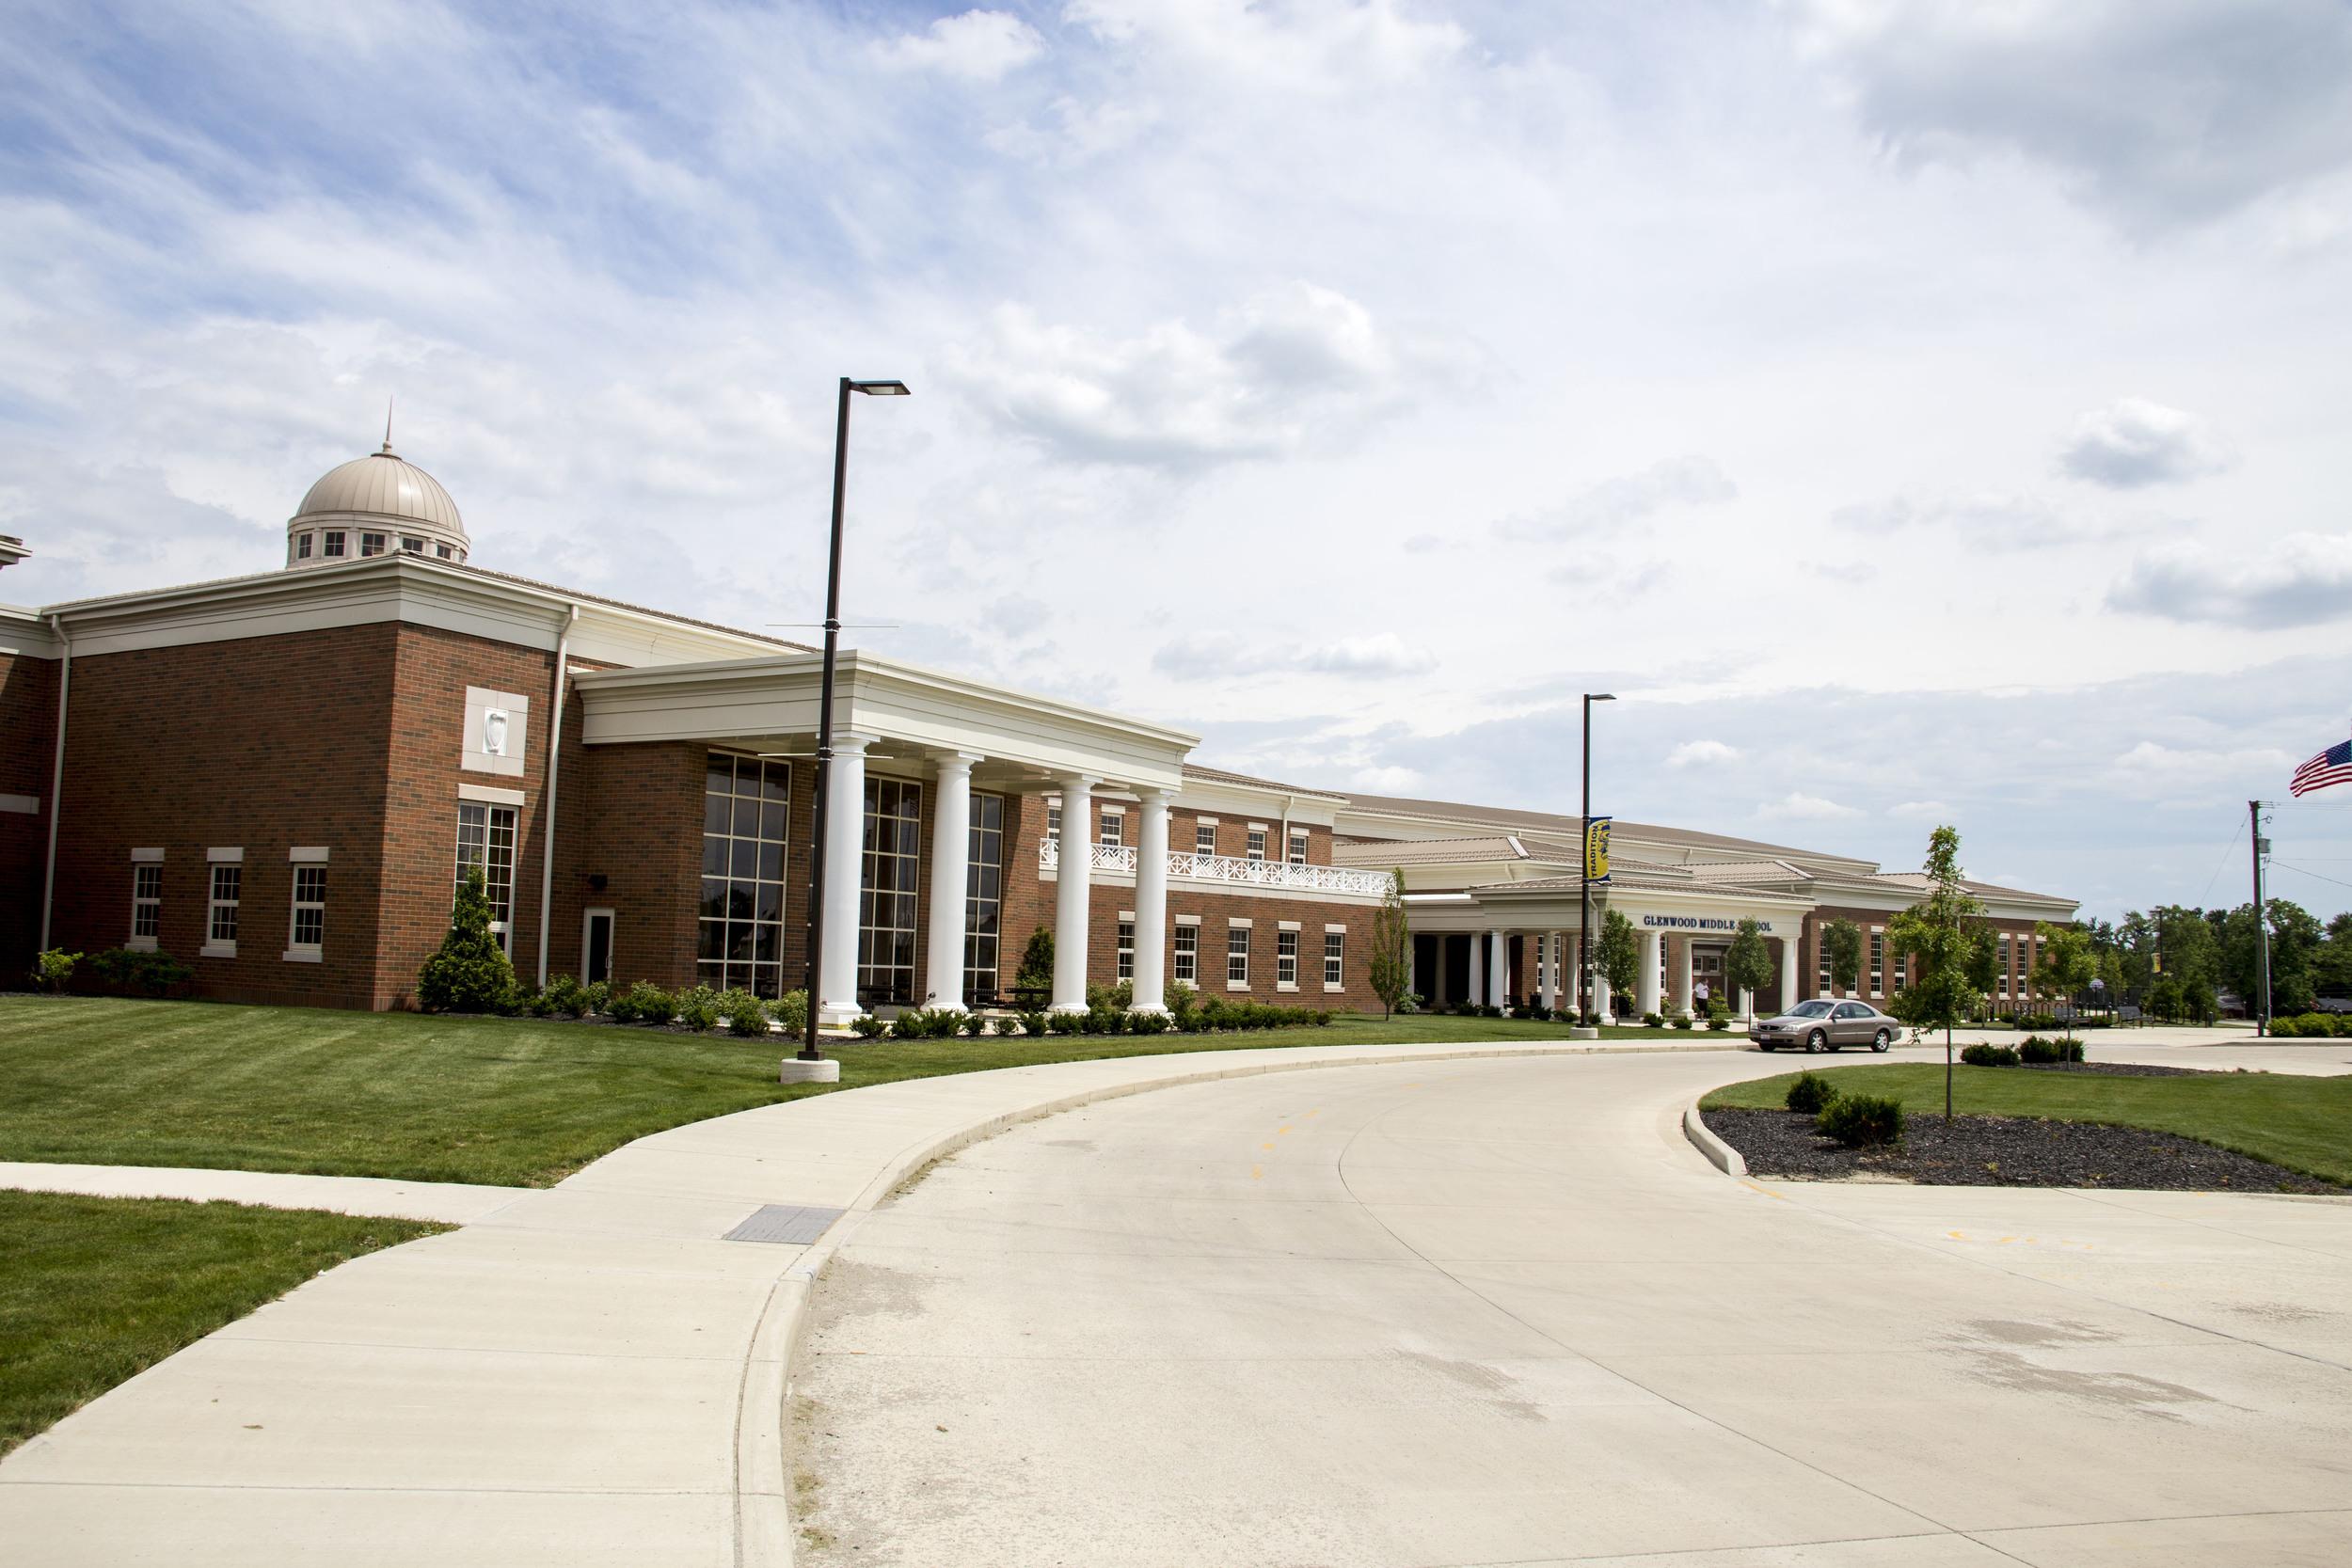 www.rcmarchitects.com - findlay city schools - glenwood middle school (2)